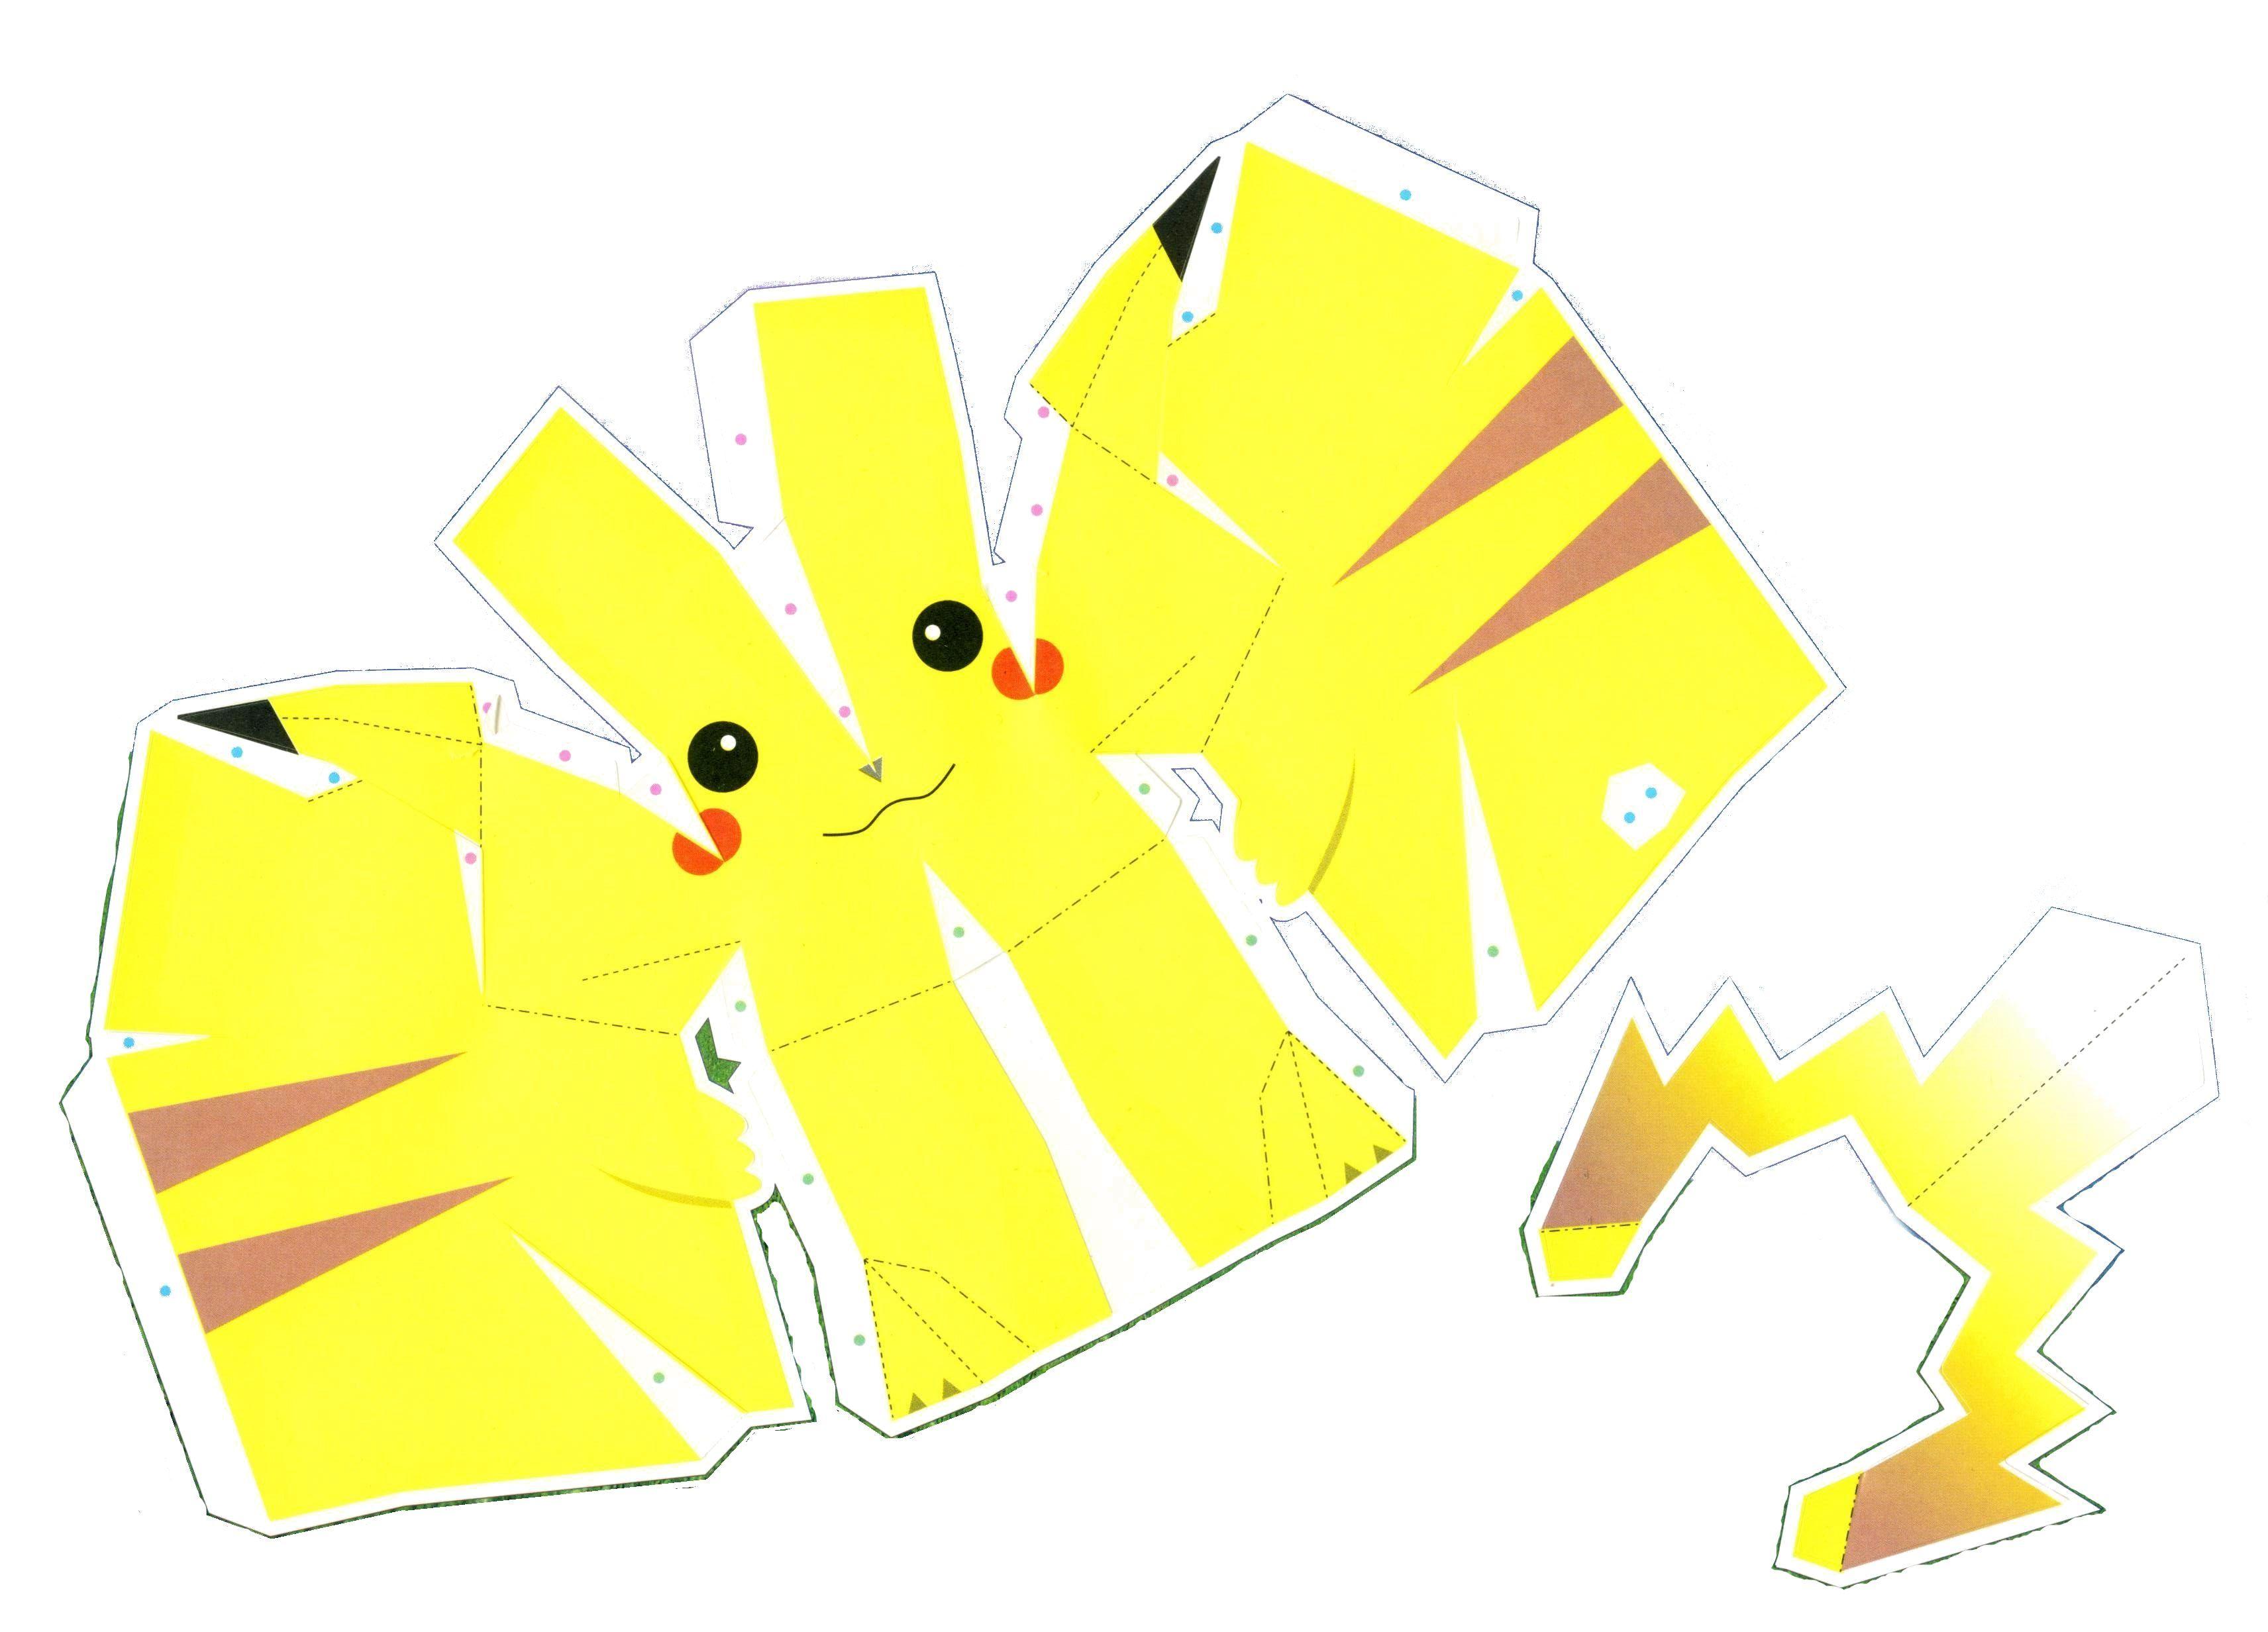 anime papercraft templates pikachu alternative versions po archives paper pinterest